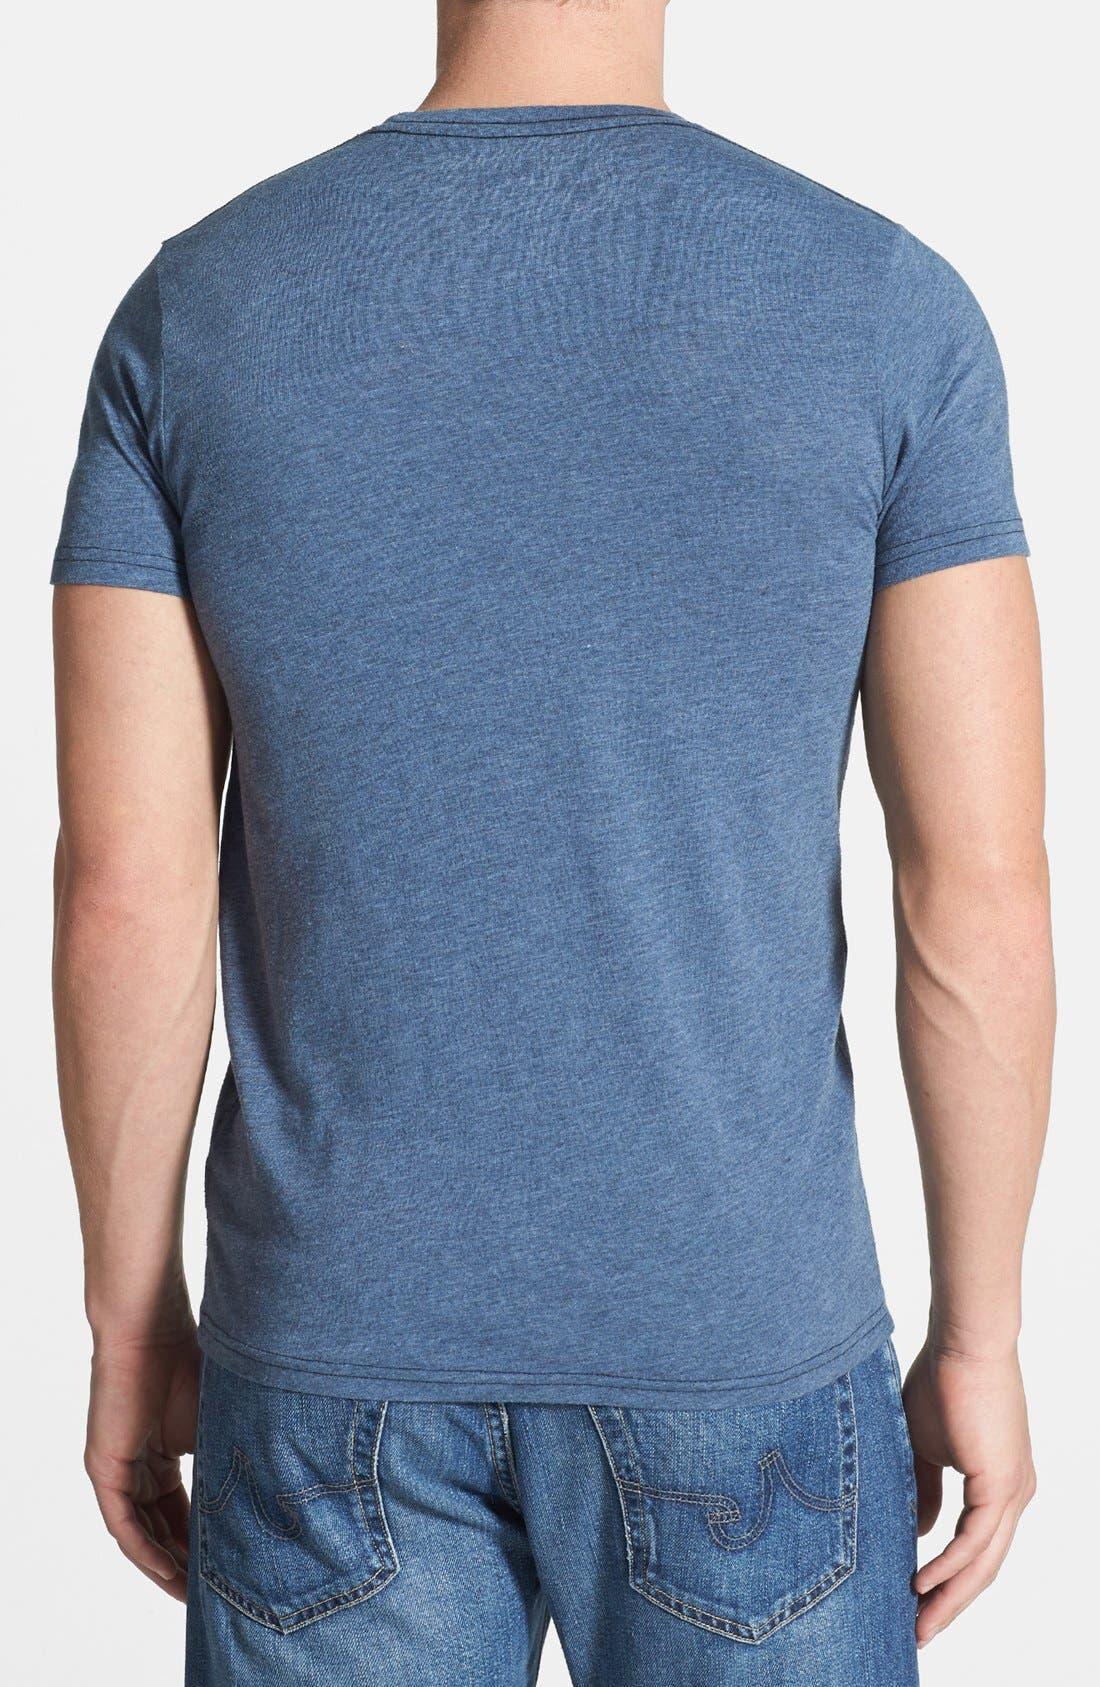 Alternate Image 2  - Retro Brand 'UCLA Bruins' Mélange T-Shirt